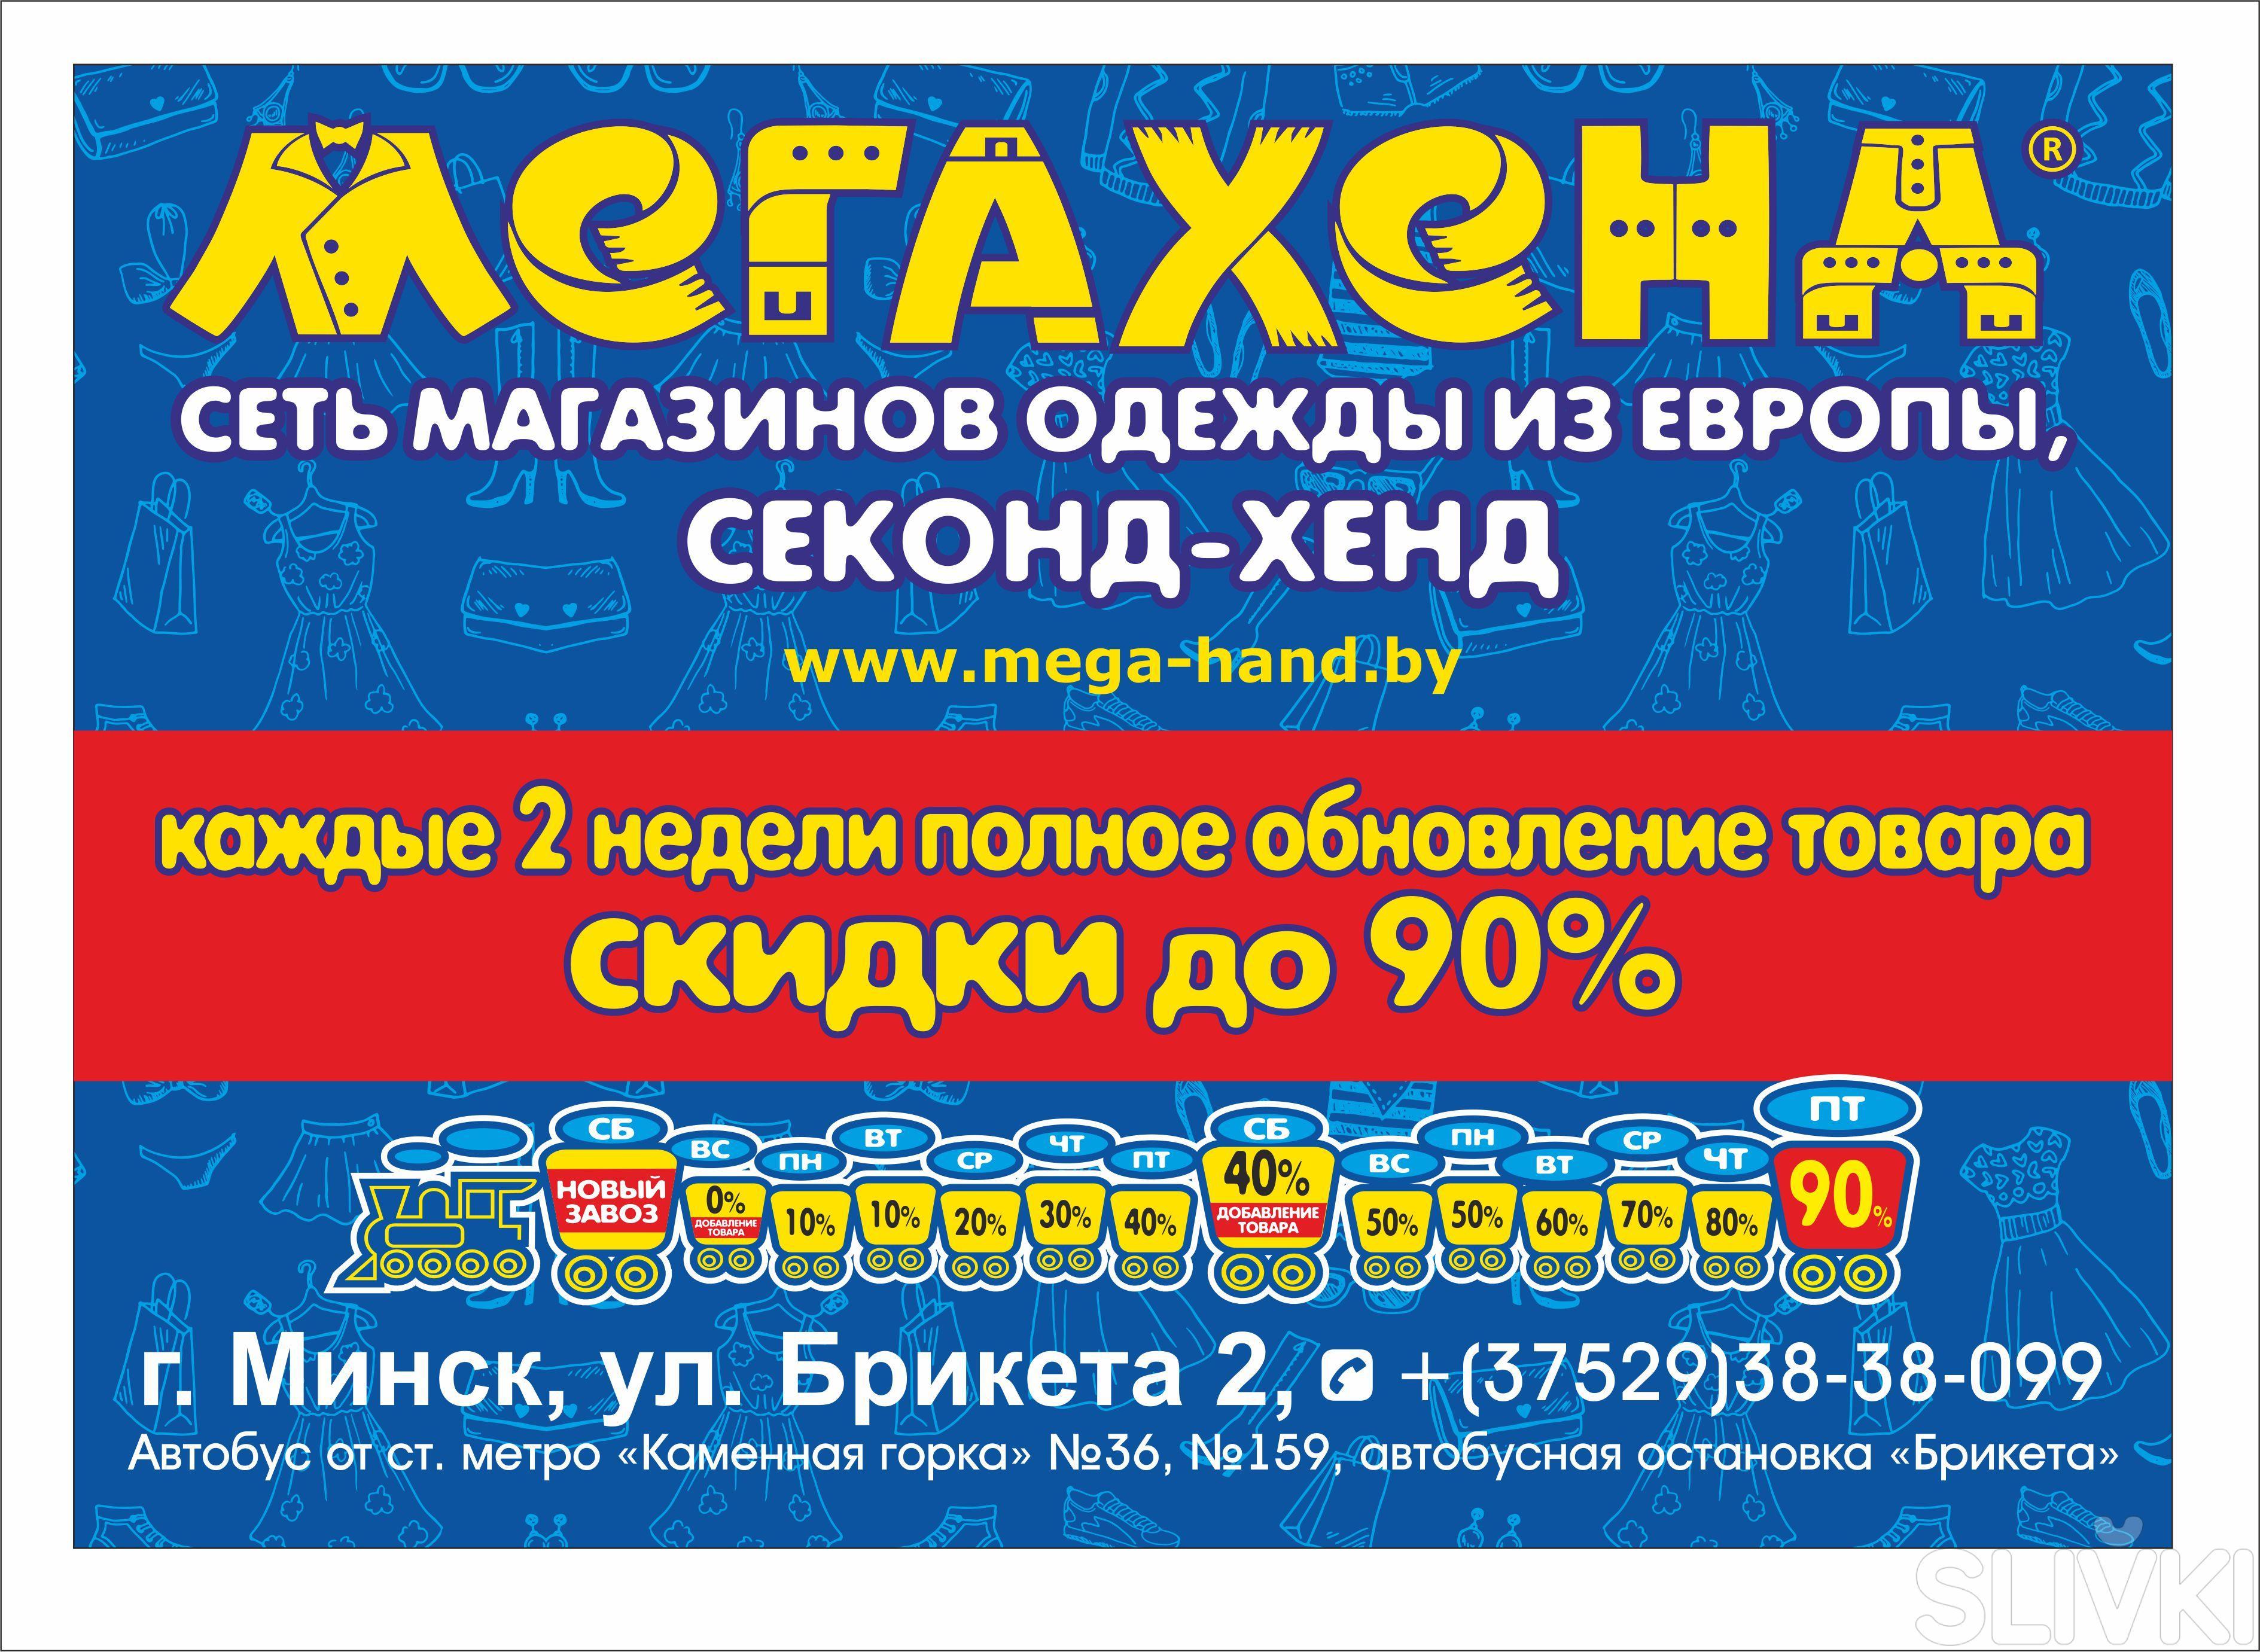 МегаХенд открылся в Минске! Скидки до 90%!